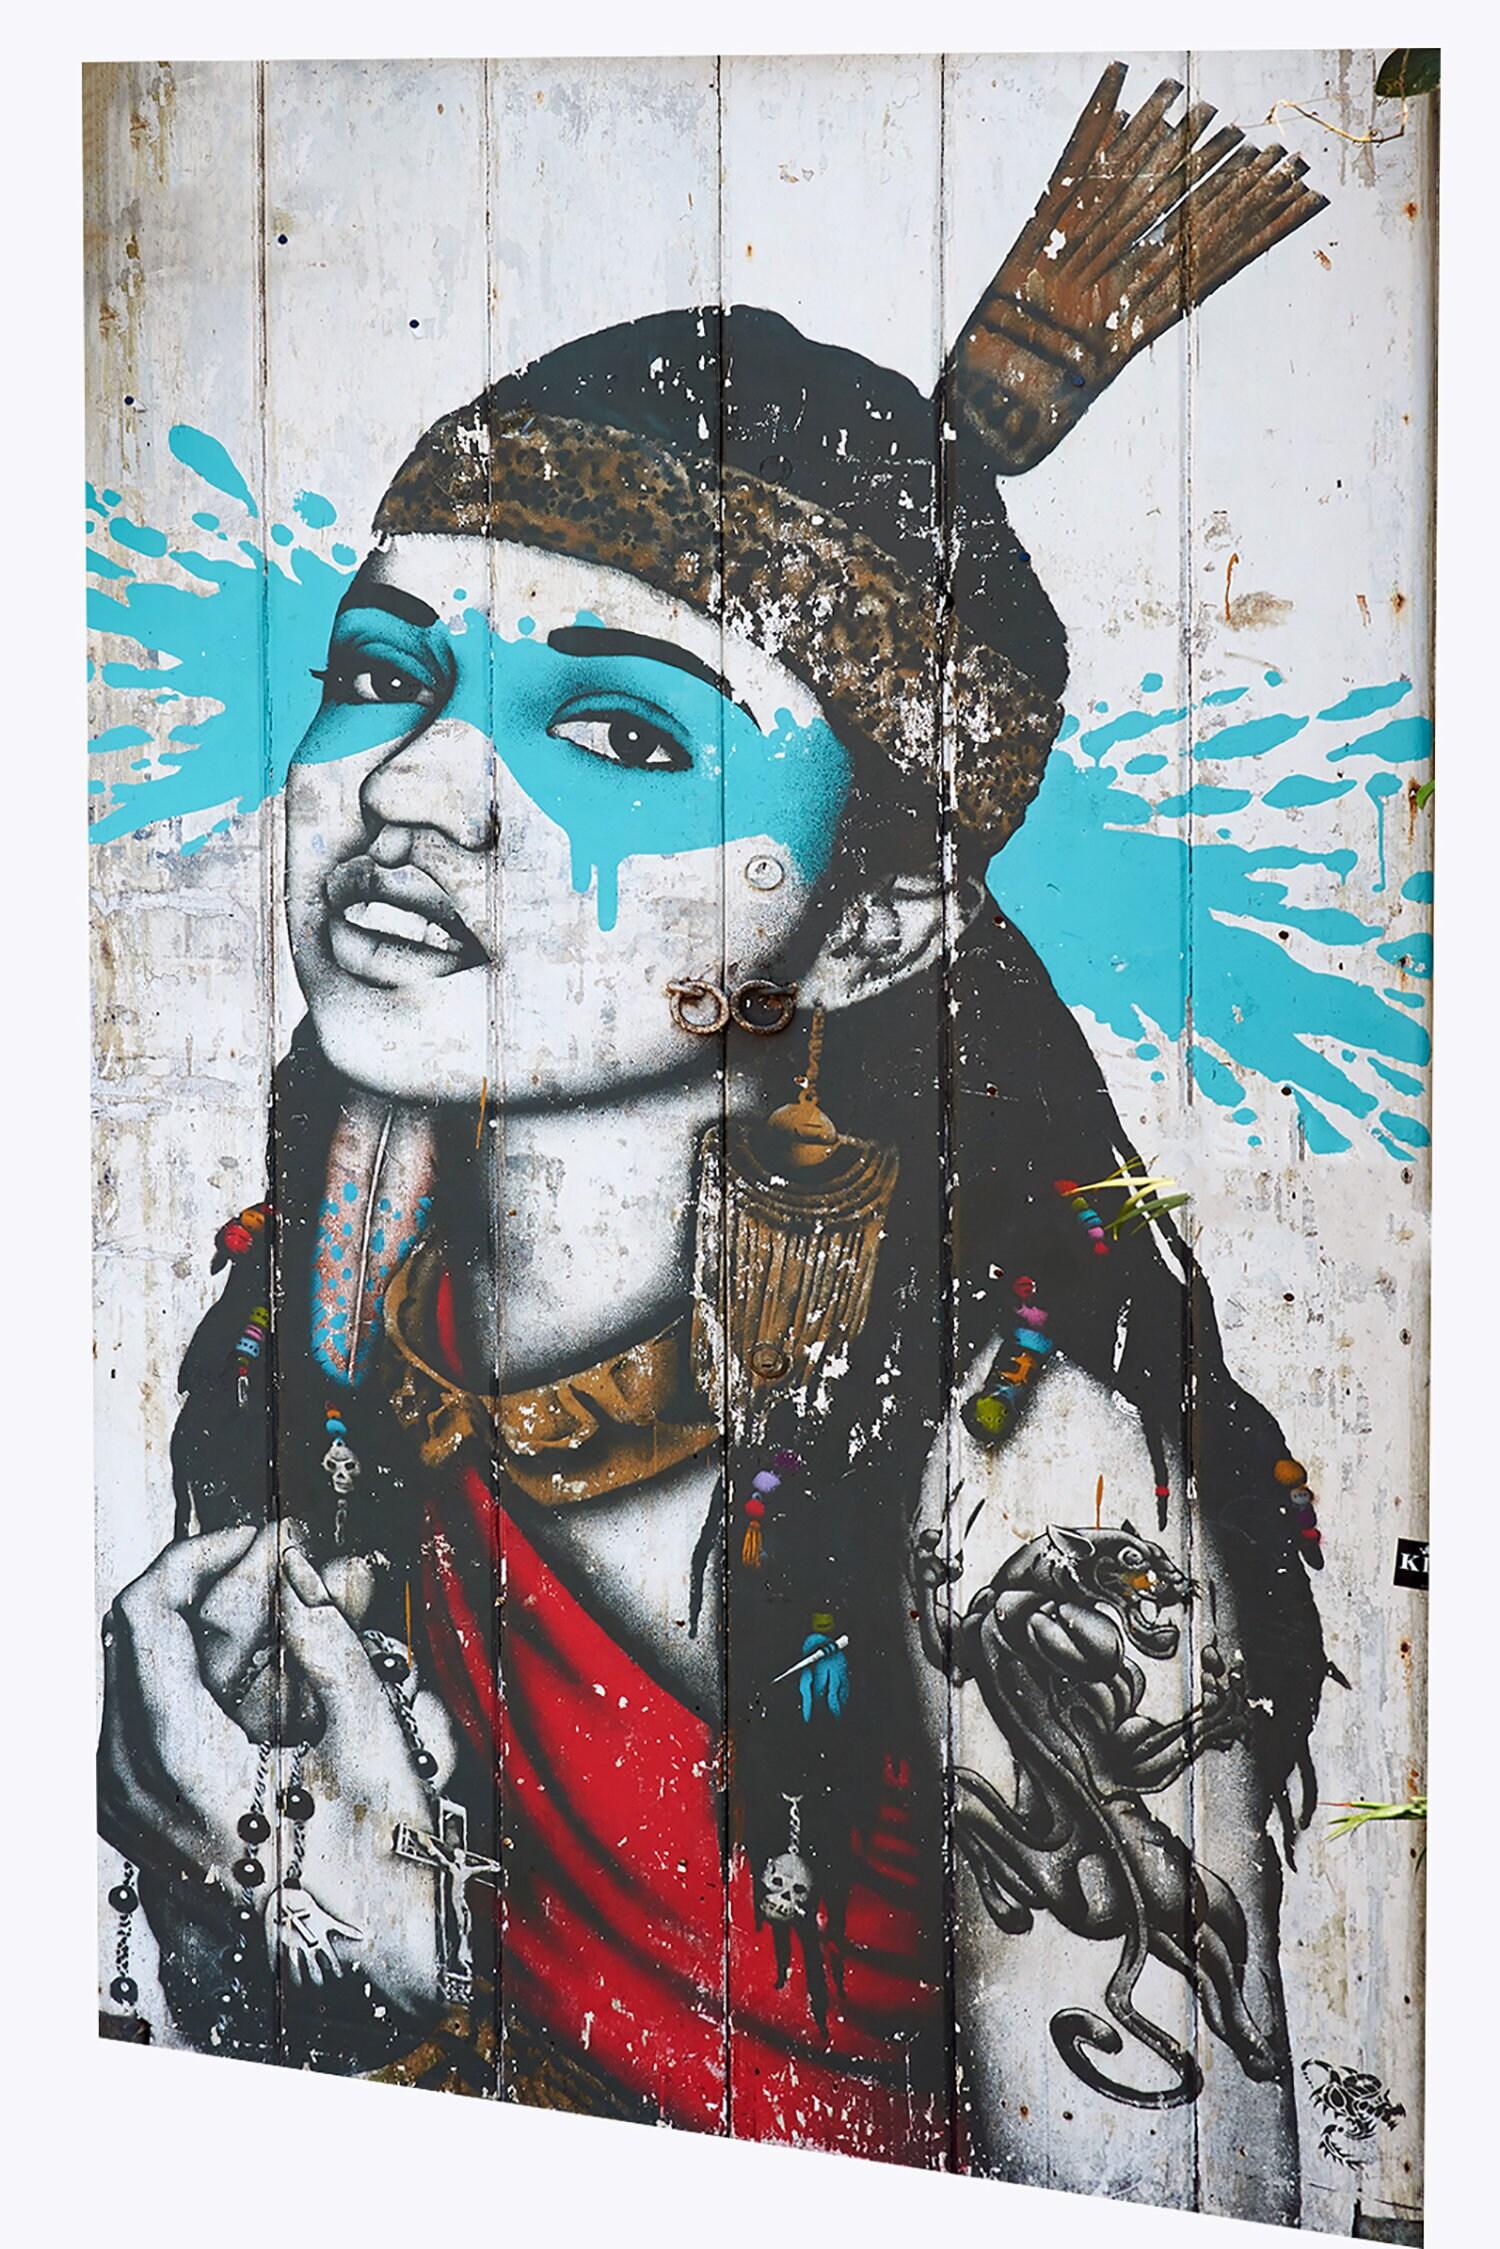 Framed canvas painting Street art Graffiti banksy abstract